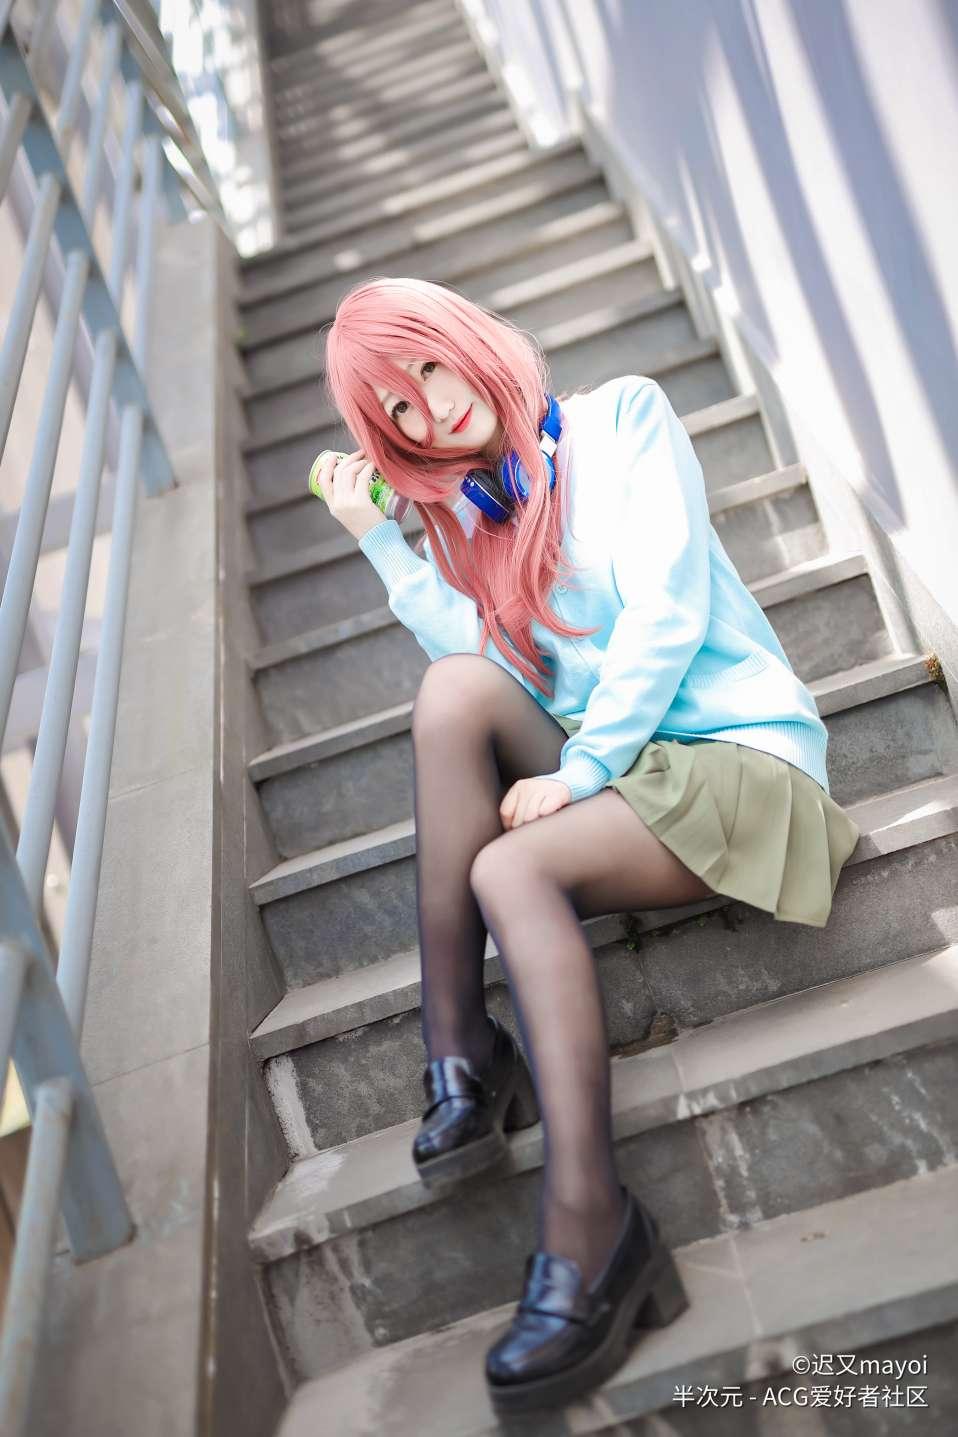 【cos】三玖~,晚上睡觉腿困是什么原因引起的-小柚妹站